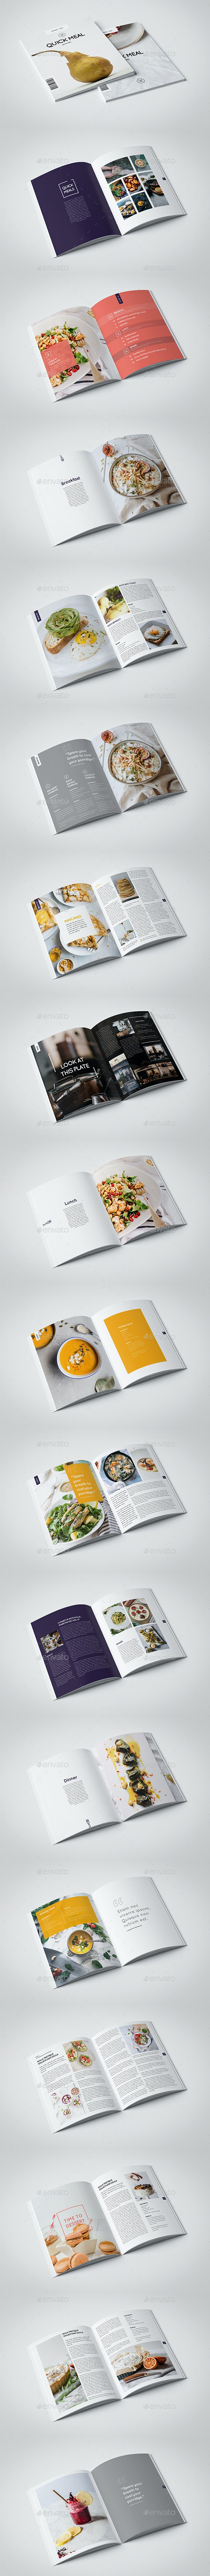 InDesign Food Magazine Template - Magazines Print Templates